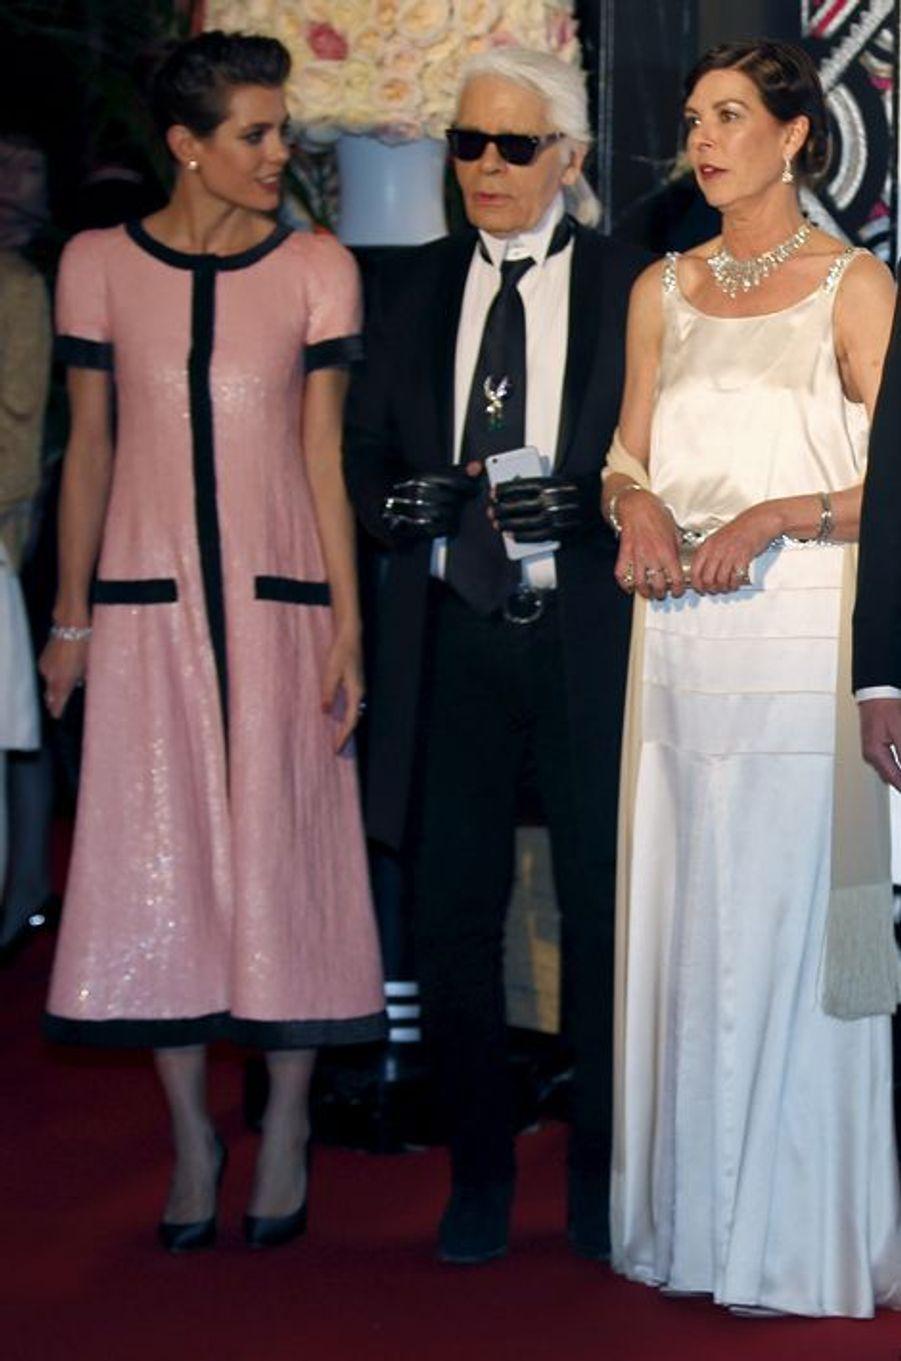 Charlotte Casiraghi avec la princesse Caroline de Hanovre et Karl Lagerfeld, le 28 mars 2015